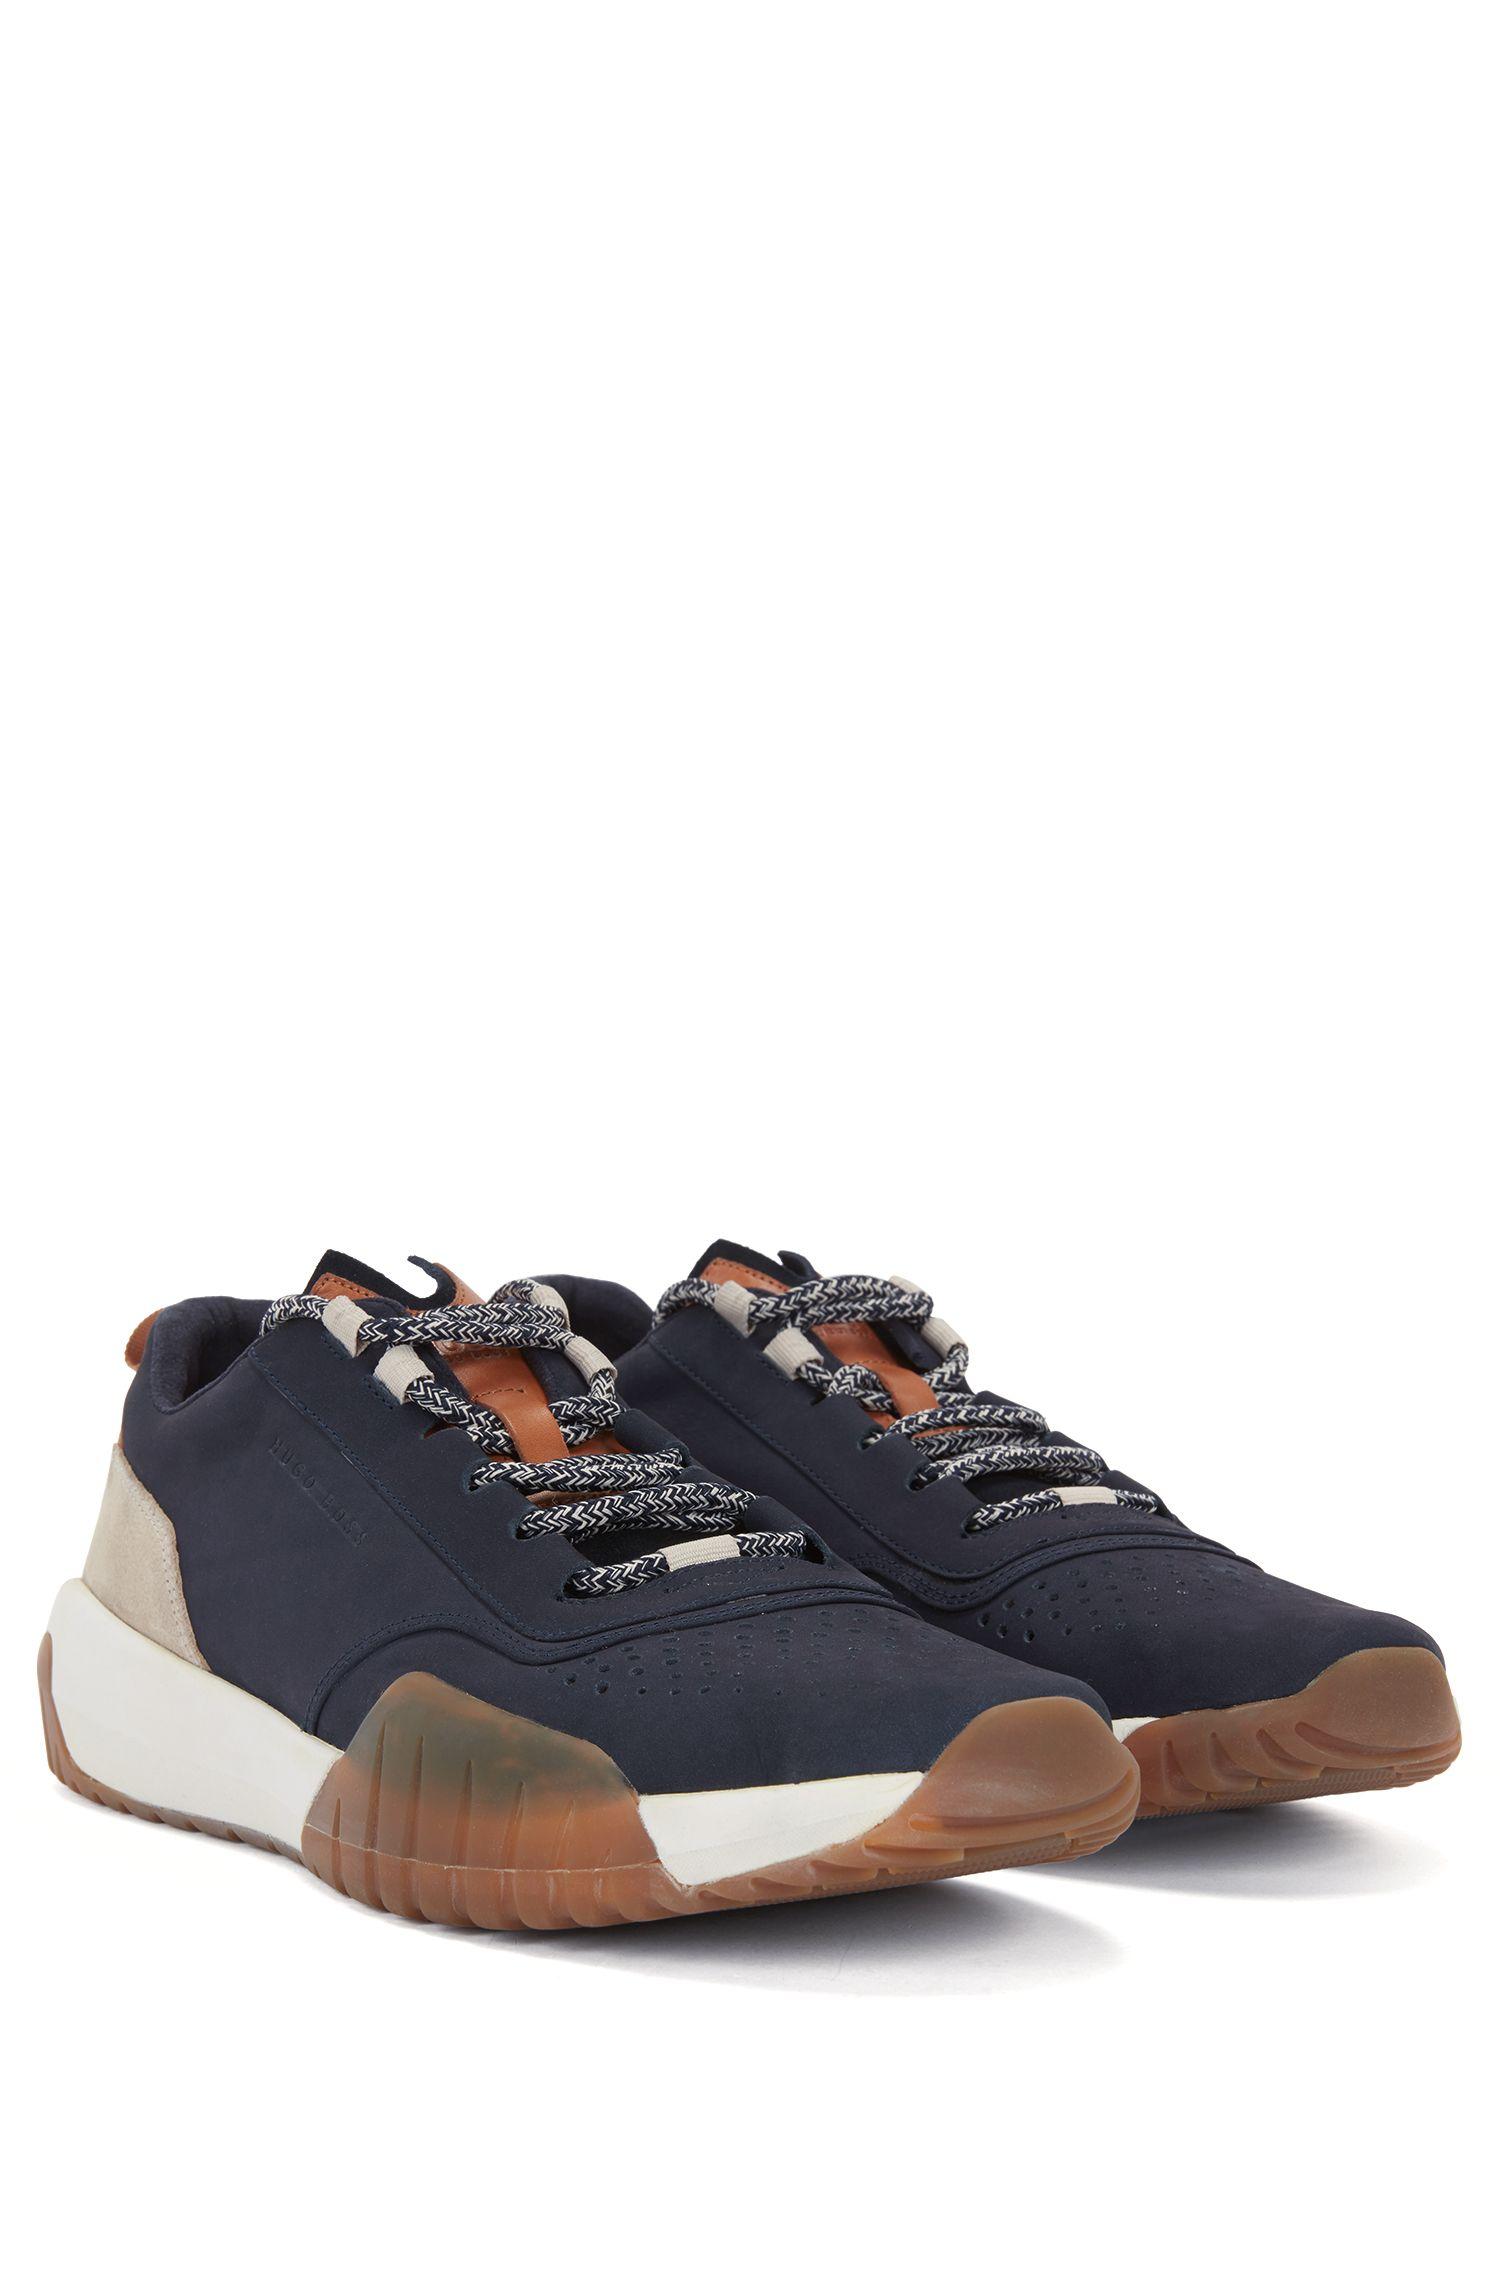 Ledersneakers mit Strobel-Machart, Dunkelblau